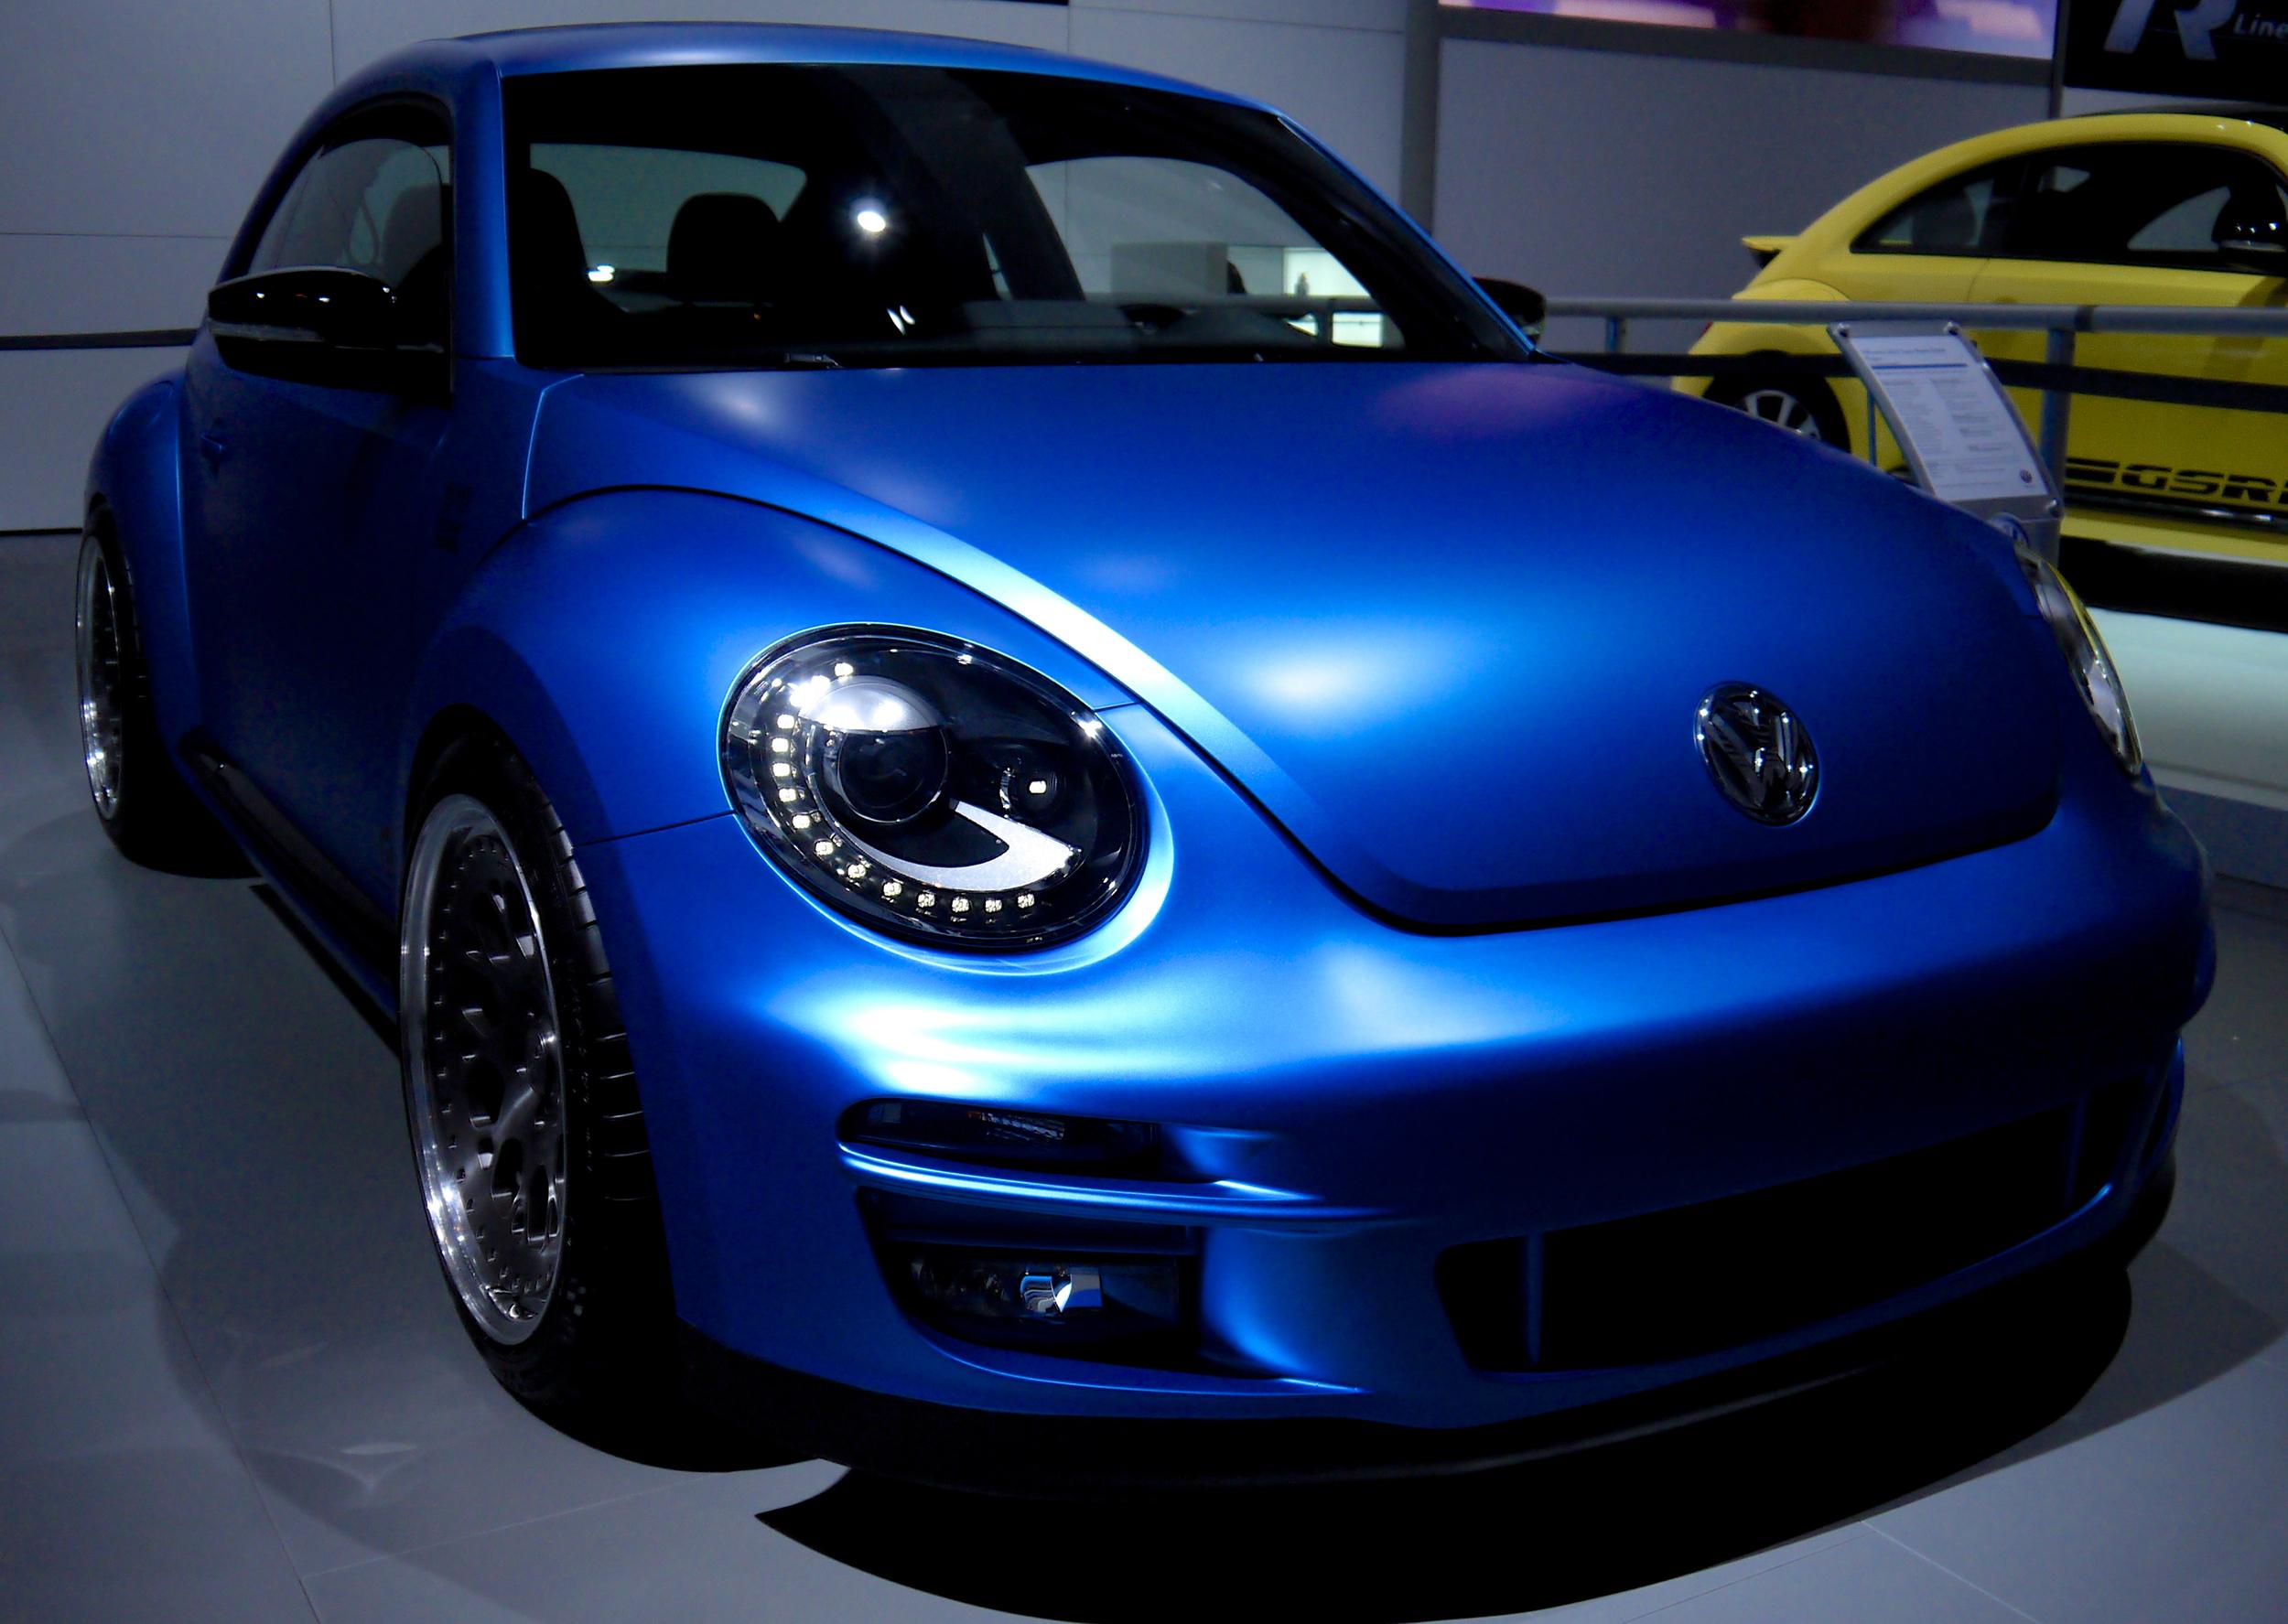 P1030568 Beetle